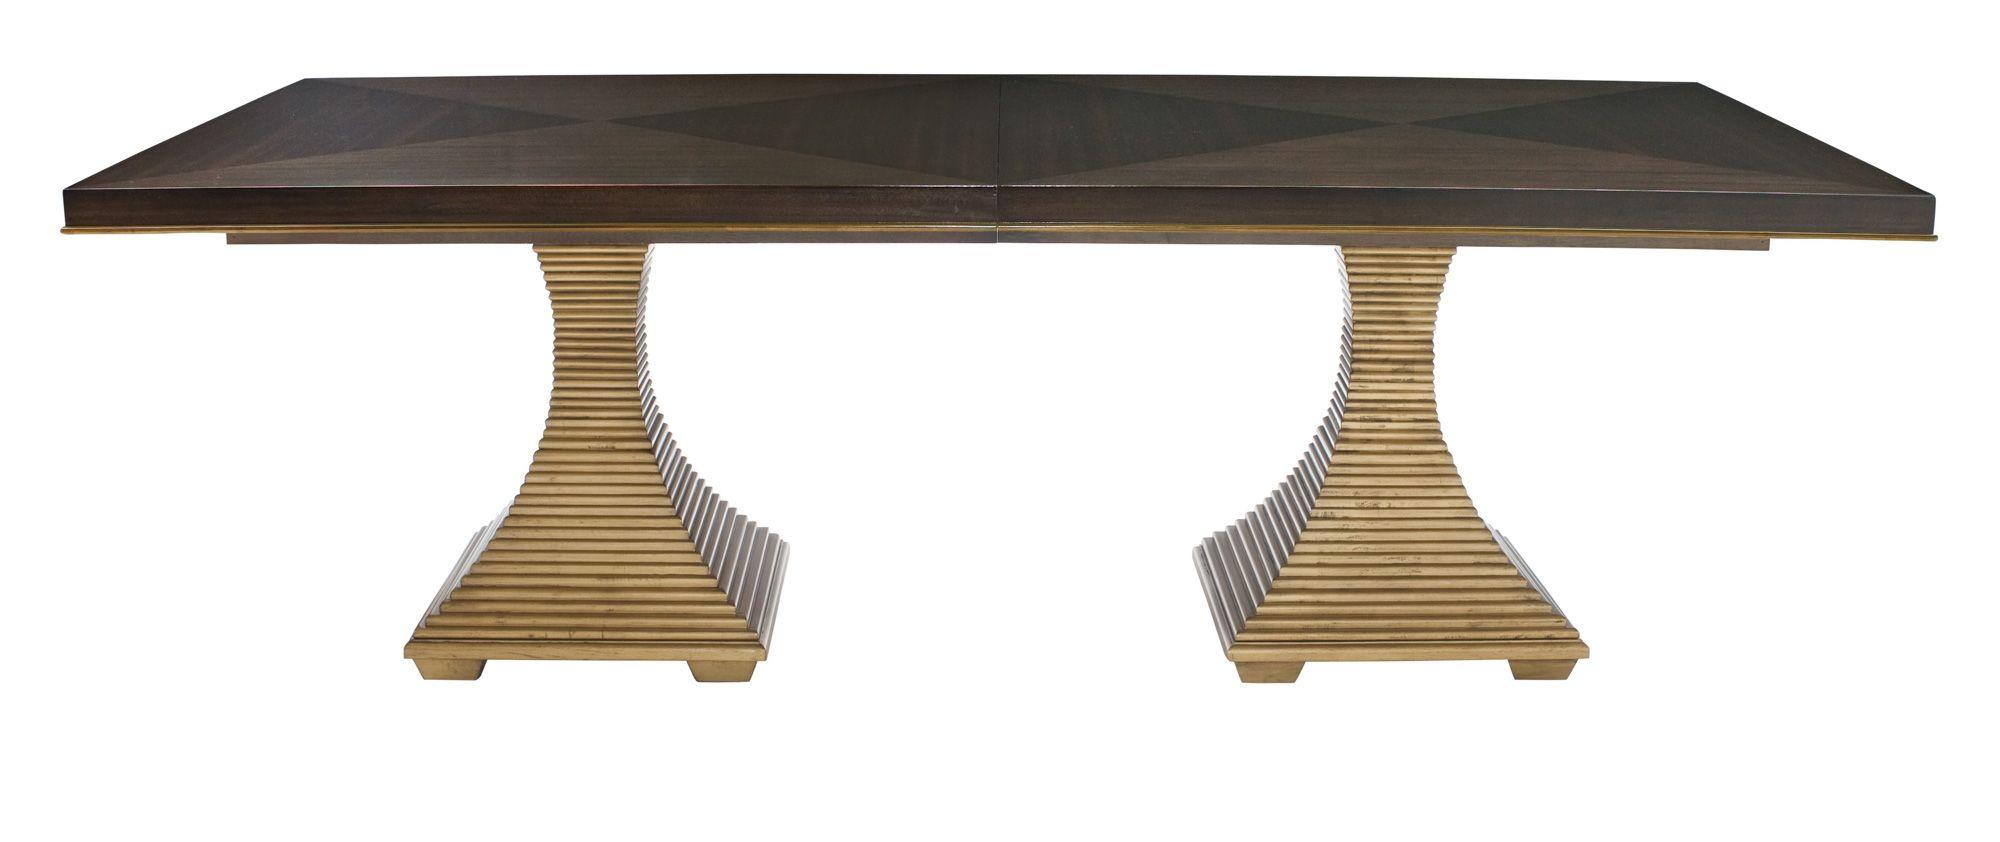 Bernhardt Jet Set Double Pedestal Dining Table In Caviar Dining